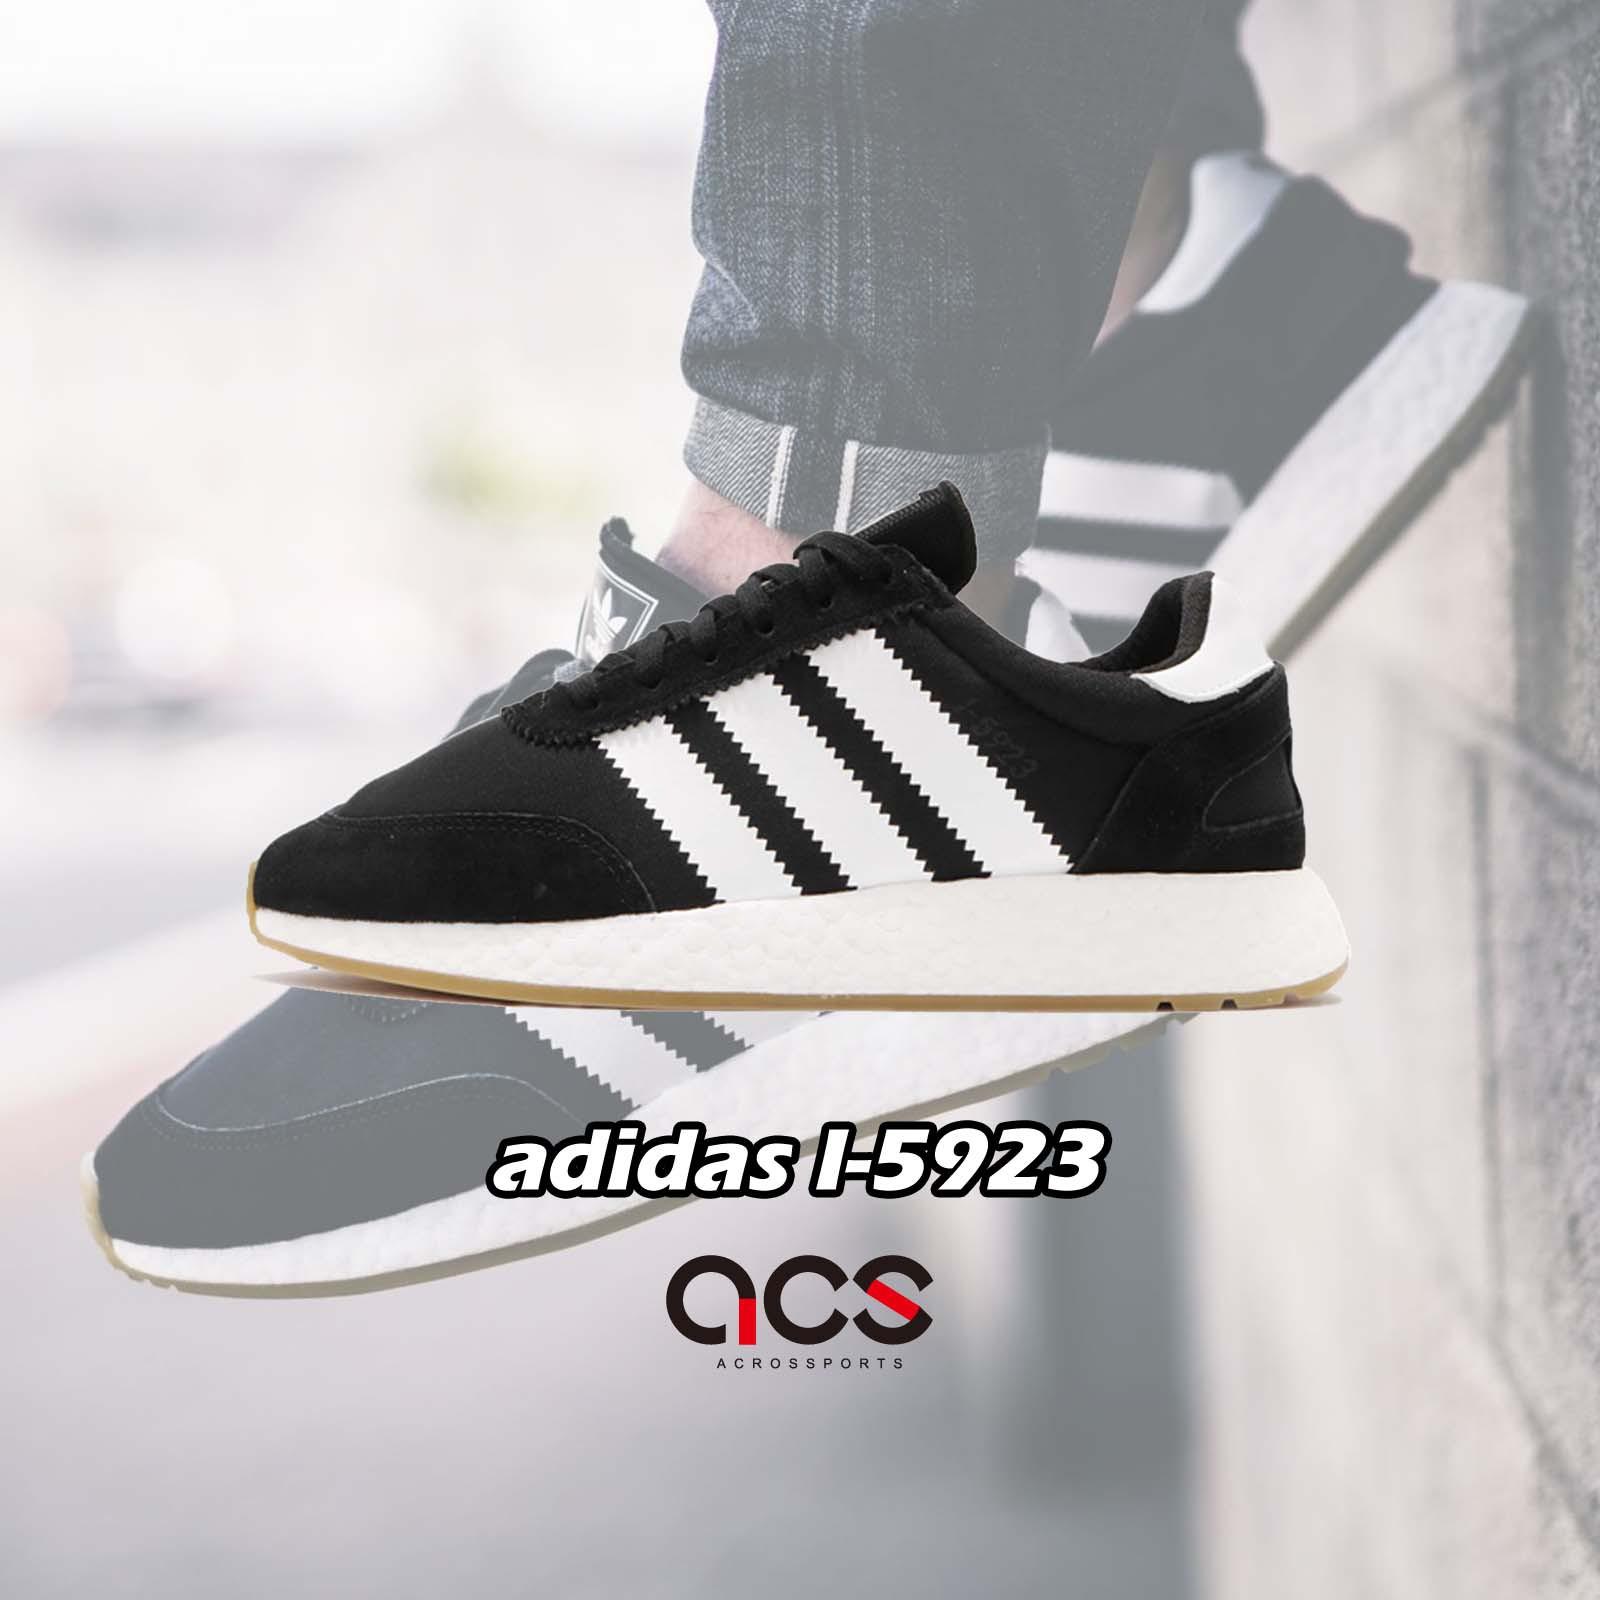 adidas 慢跑鞋 I-5923 黑 白 BOOST 中底 麂皮 復古 男鞋 女鞋 運動鞋 D97344 【ACS】